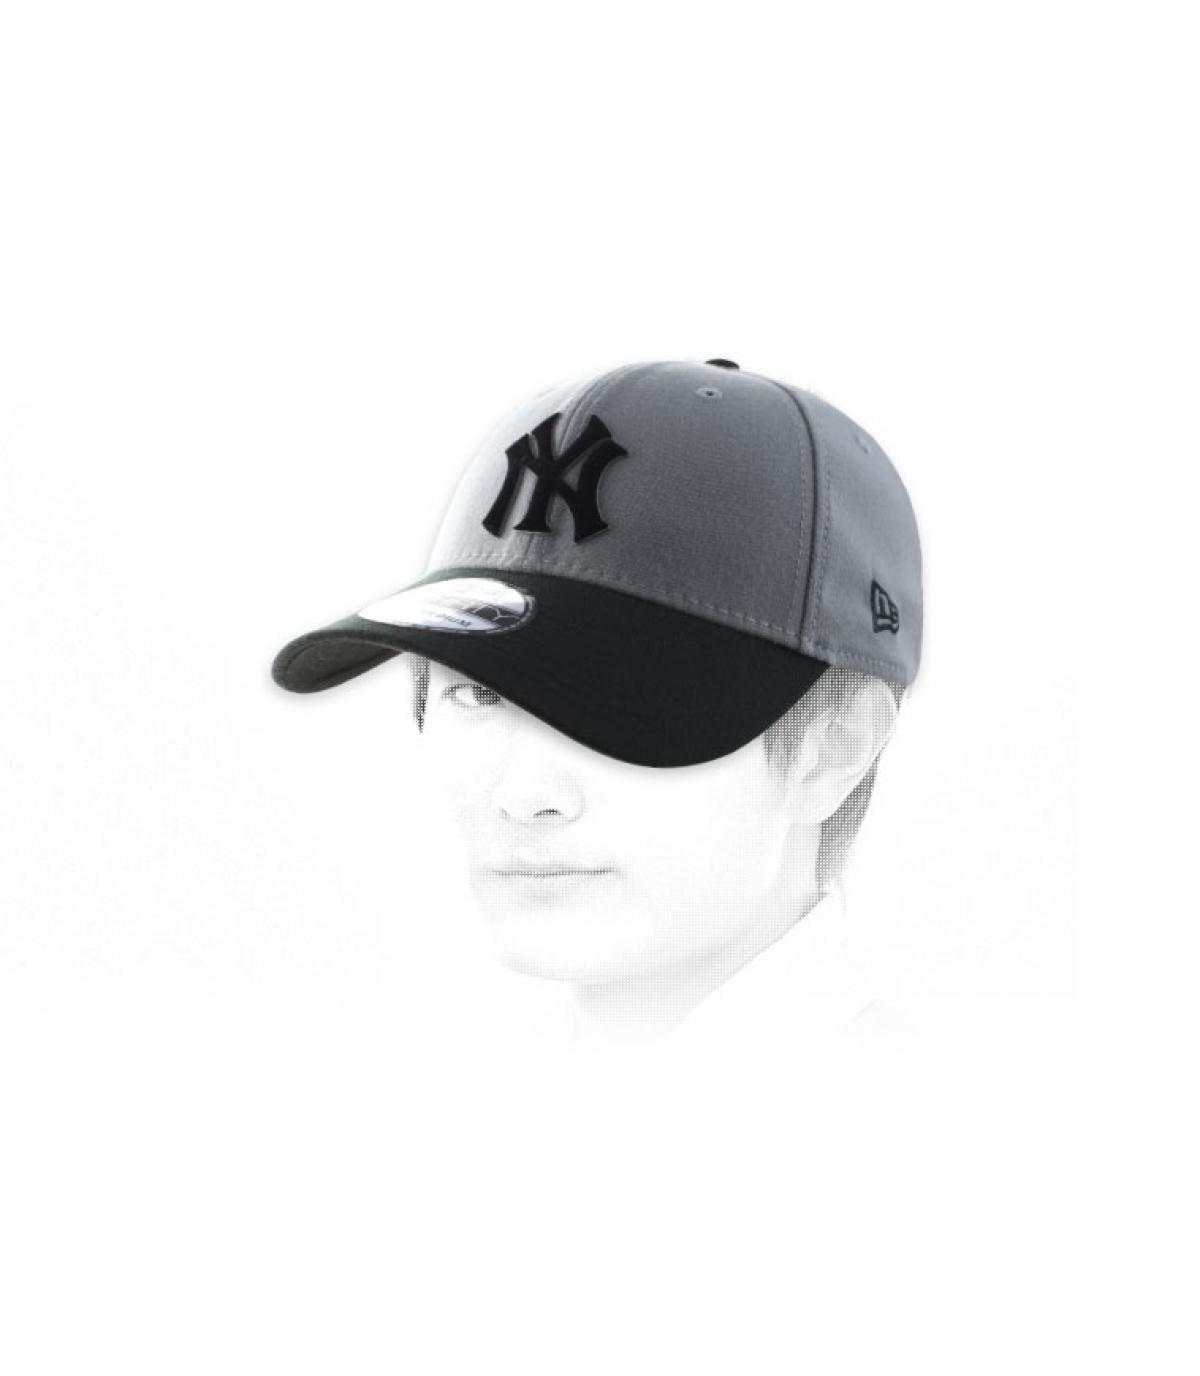 NY zwart grijs cap